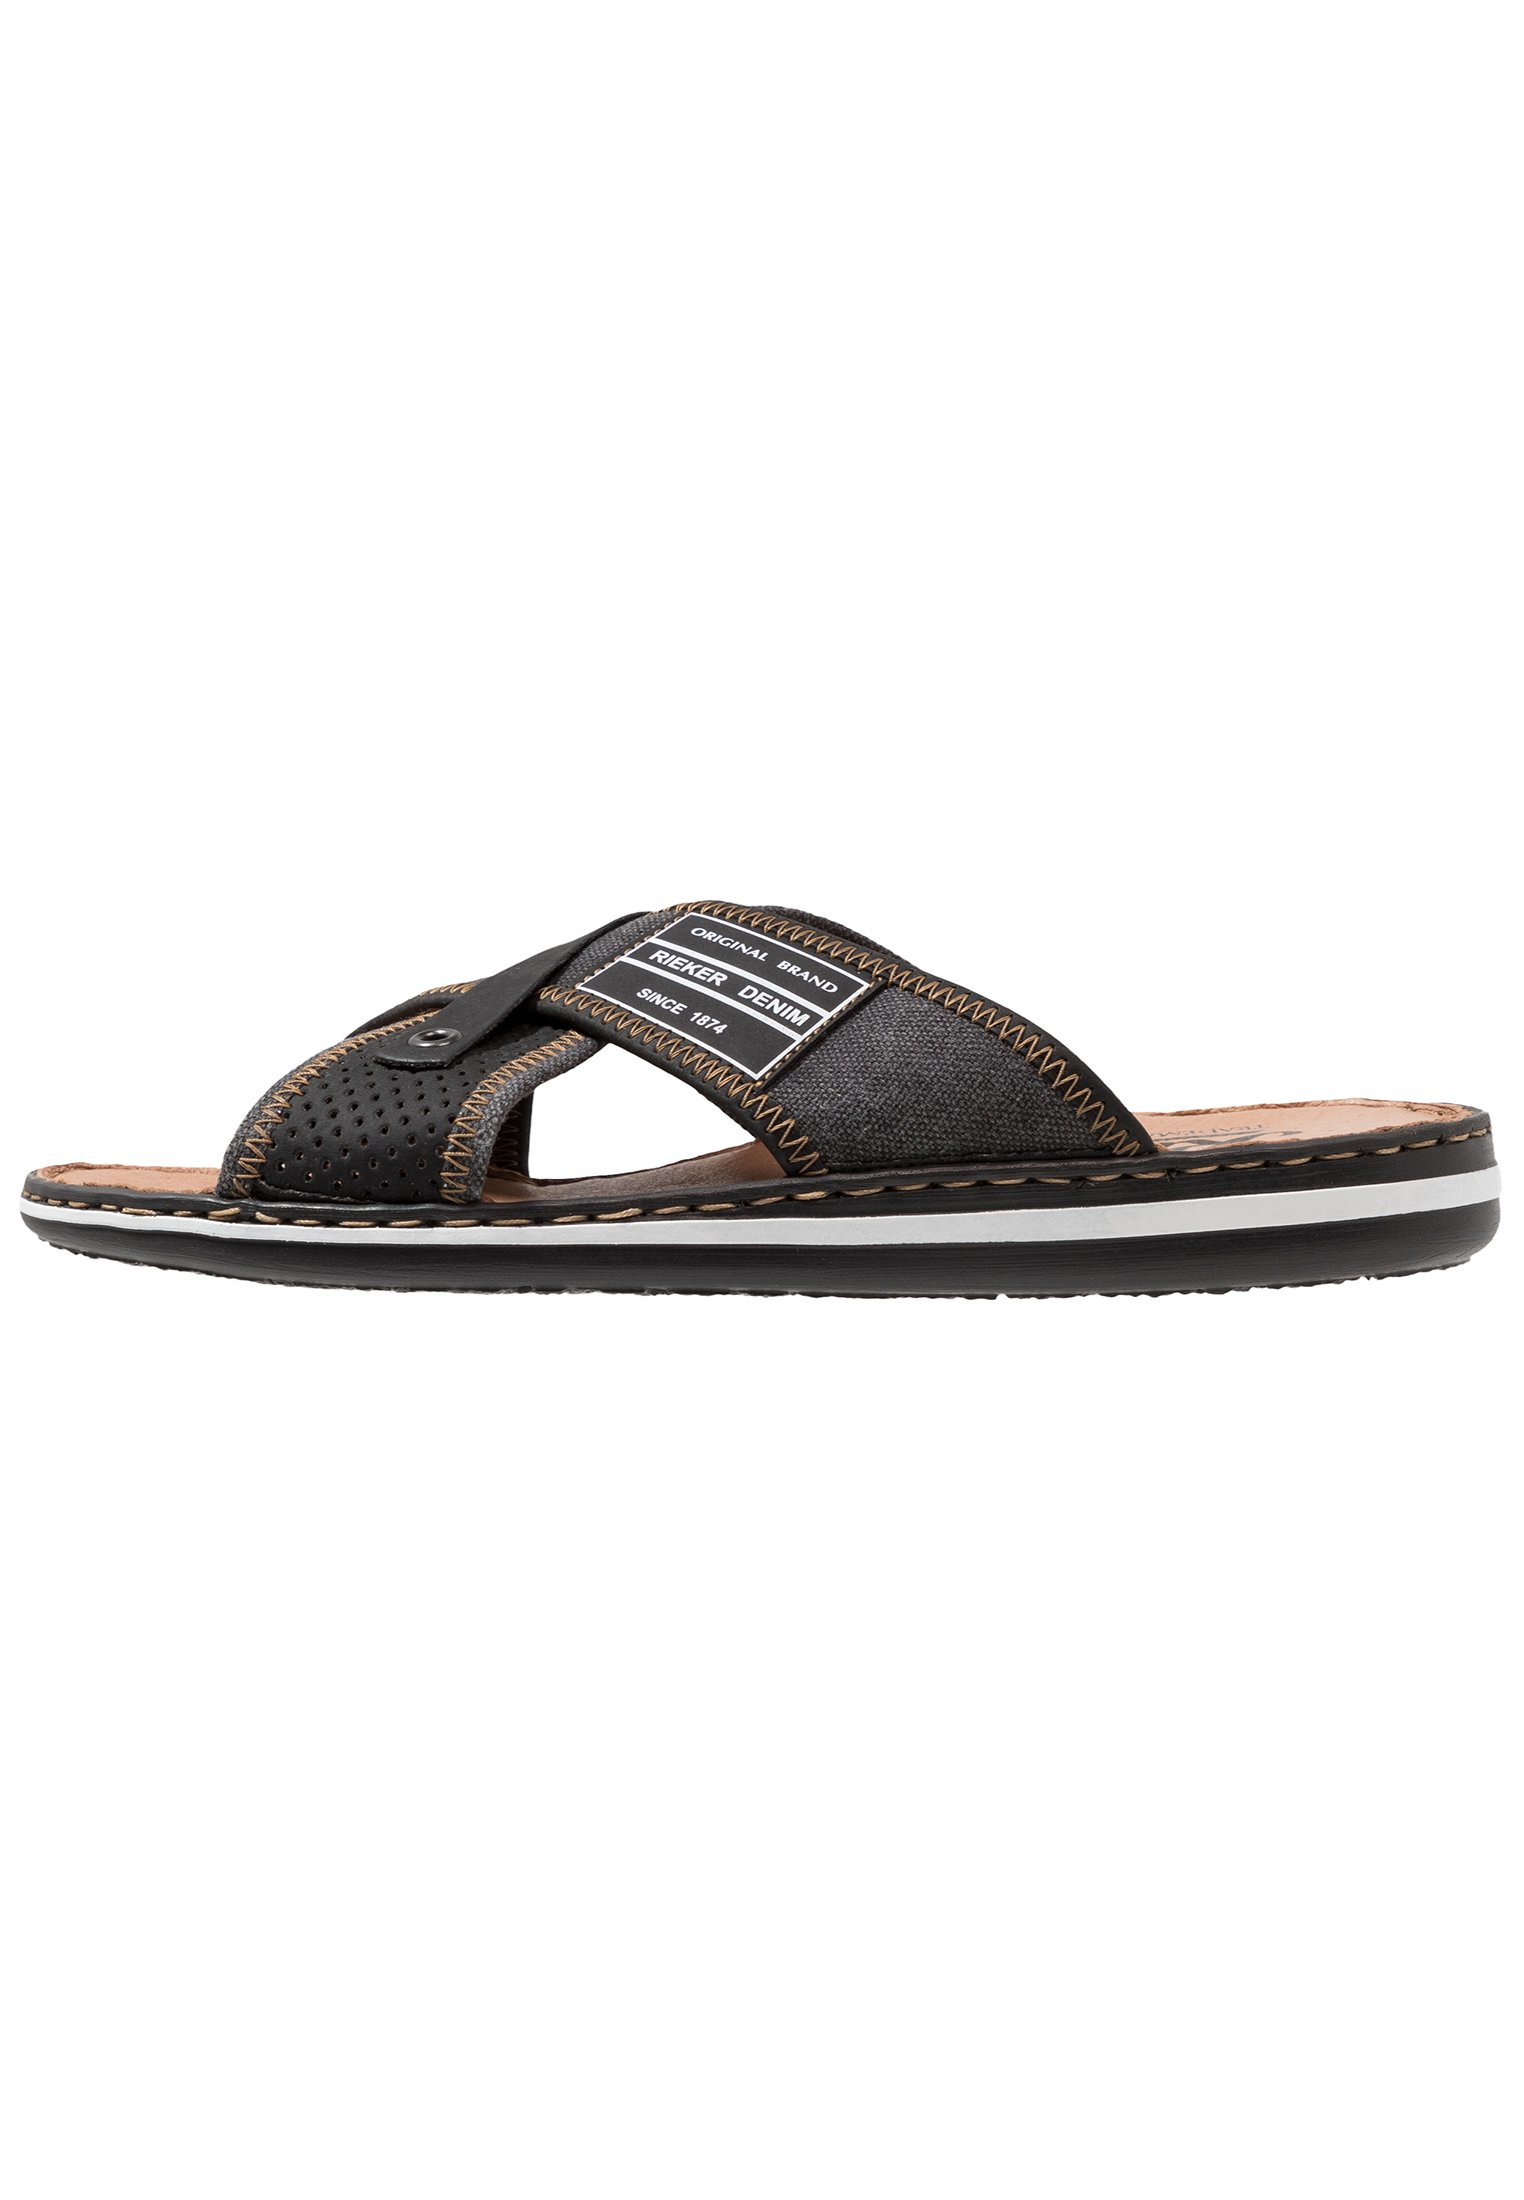 Rieker Schuhe für Herren   ZALANDO